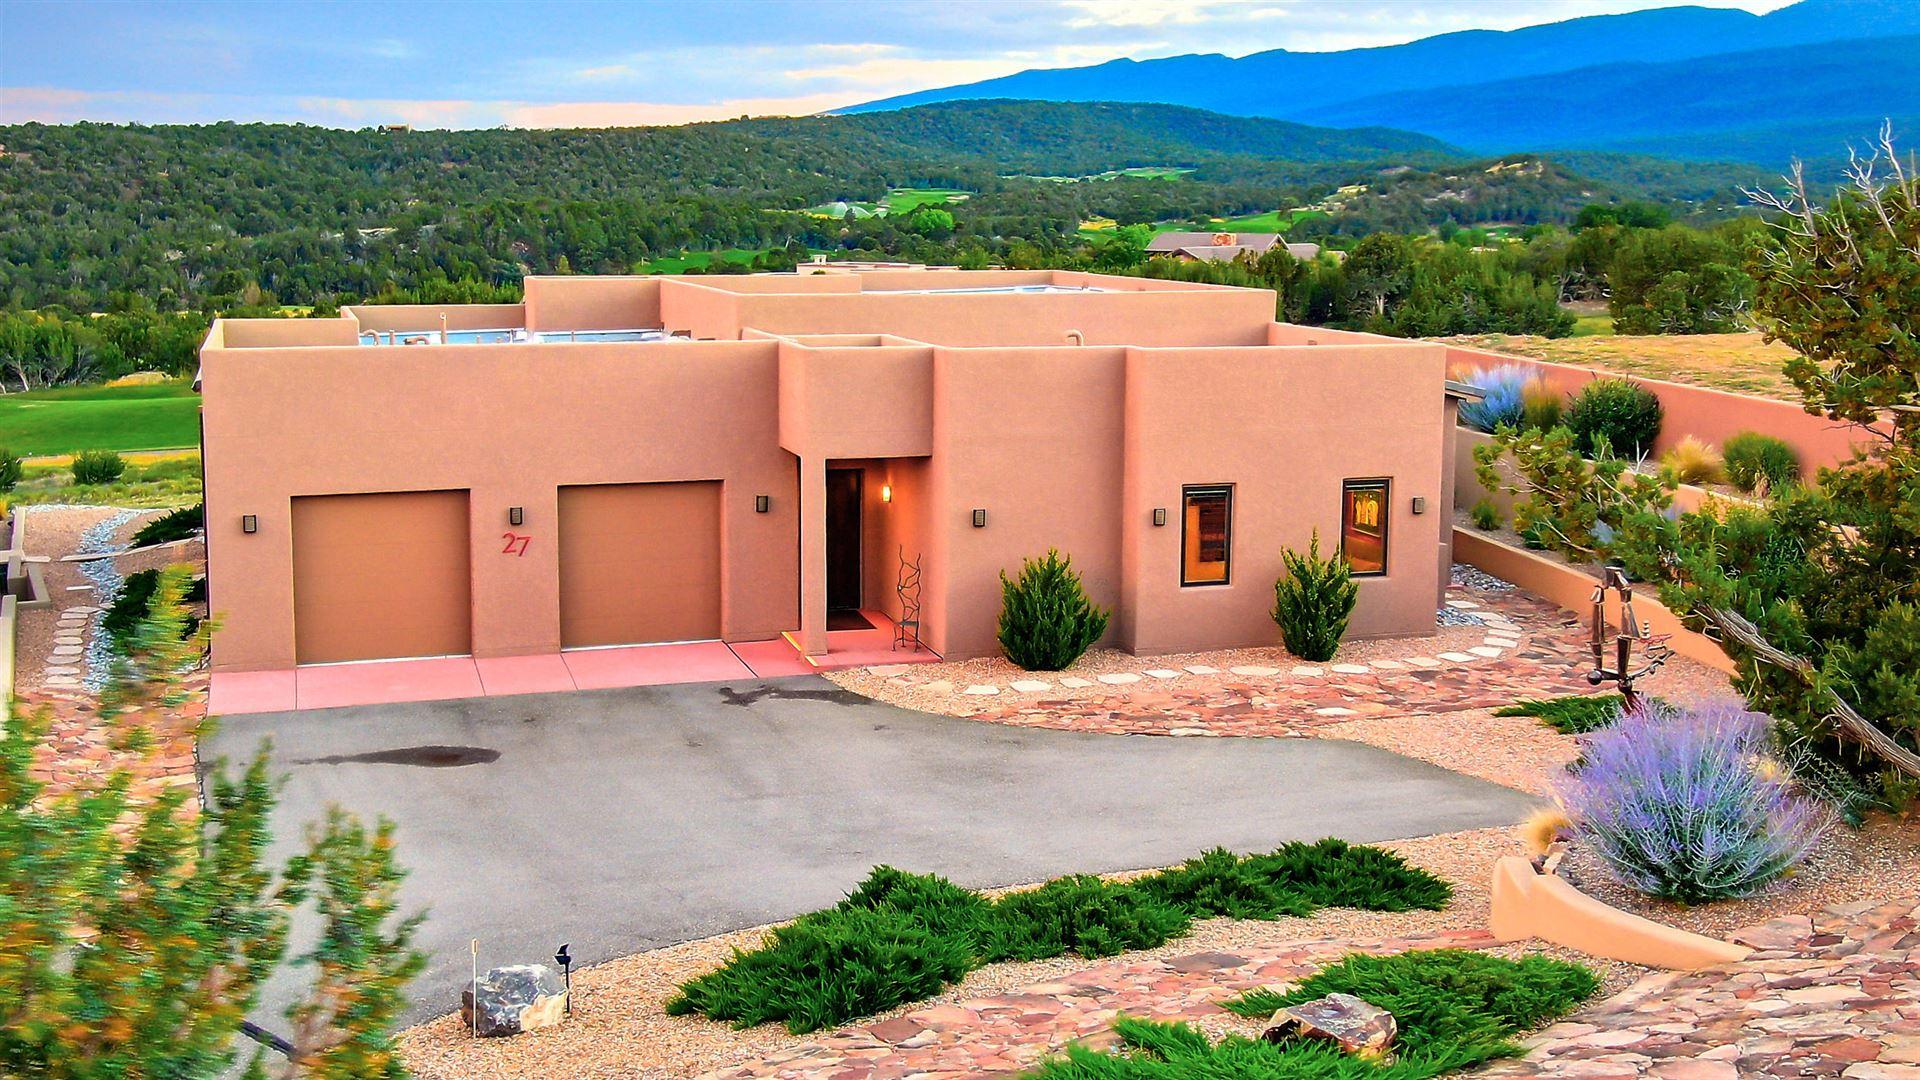 27 HOGAN Court, Sandia Park, NM 87047 - #: 967632